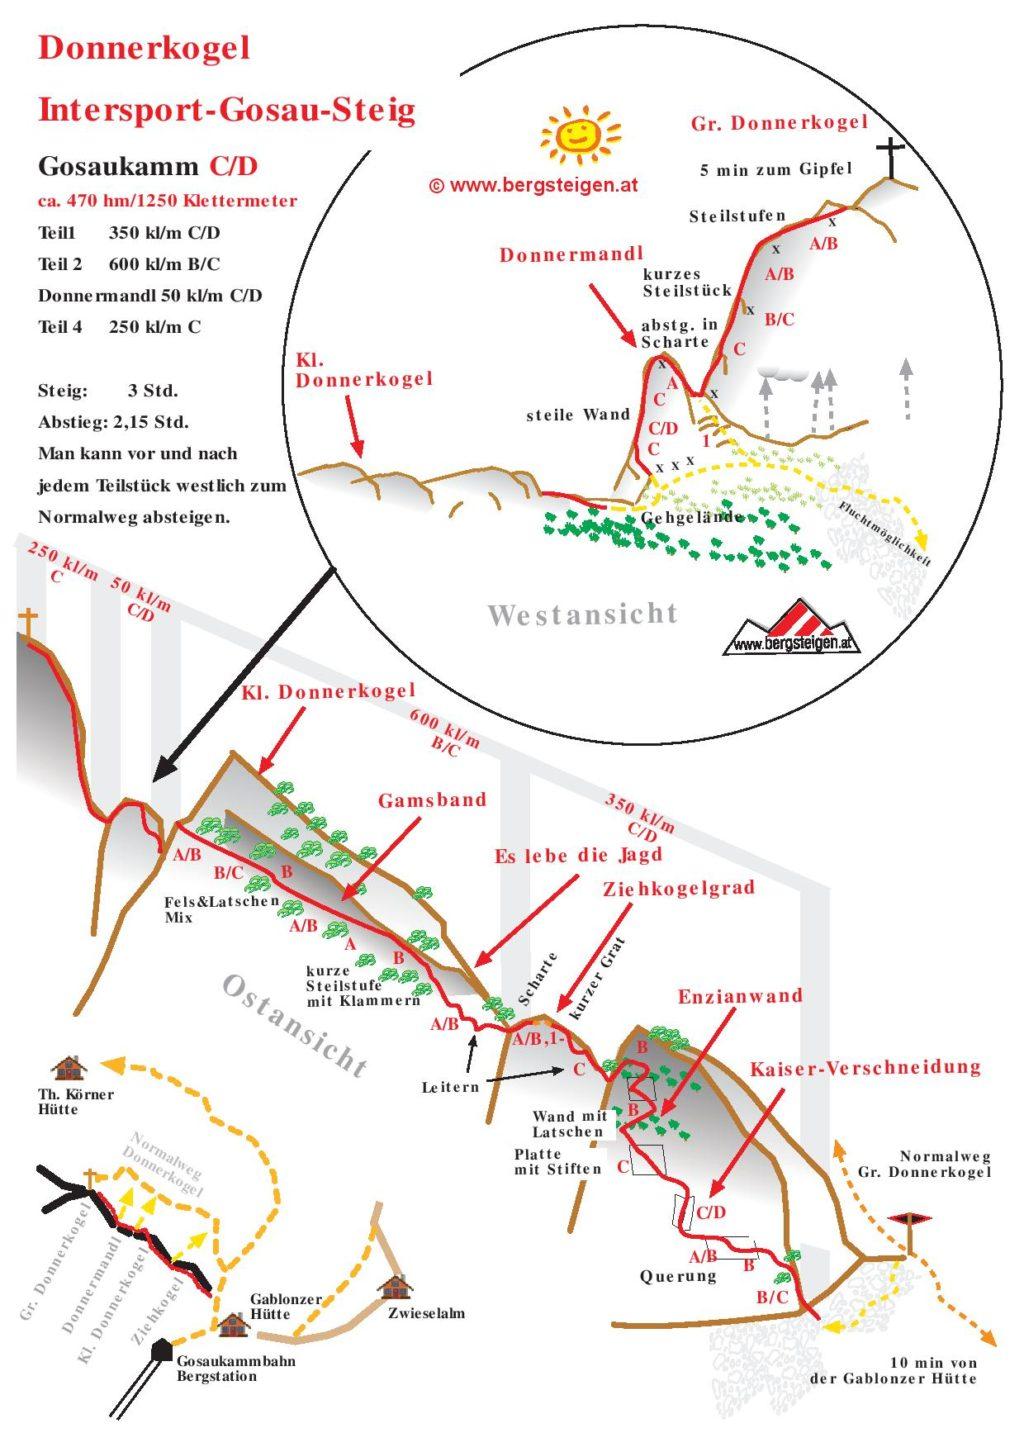 TOPO feraty Intersport Gosau Steig